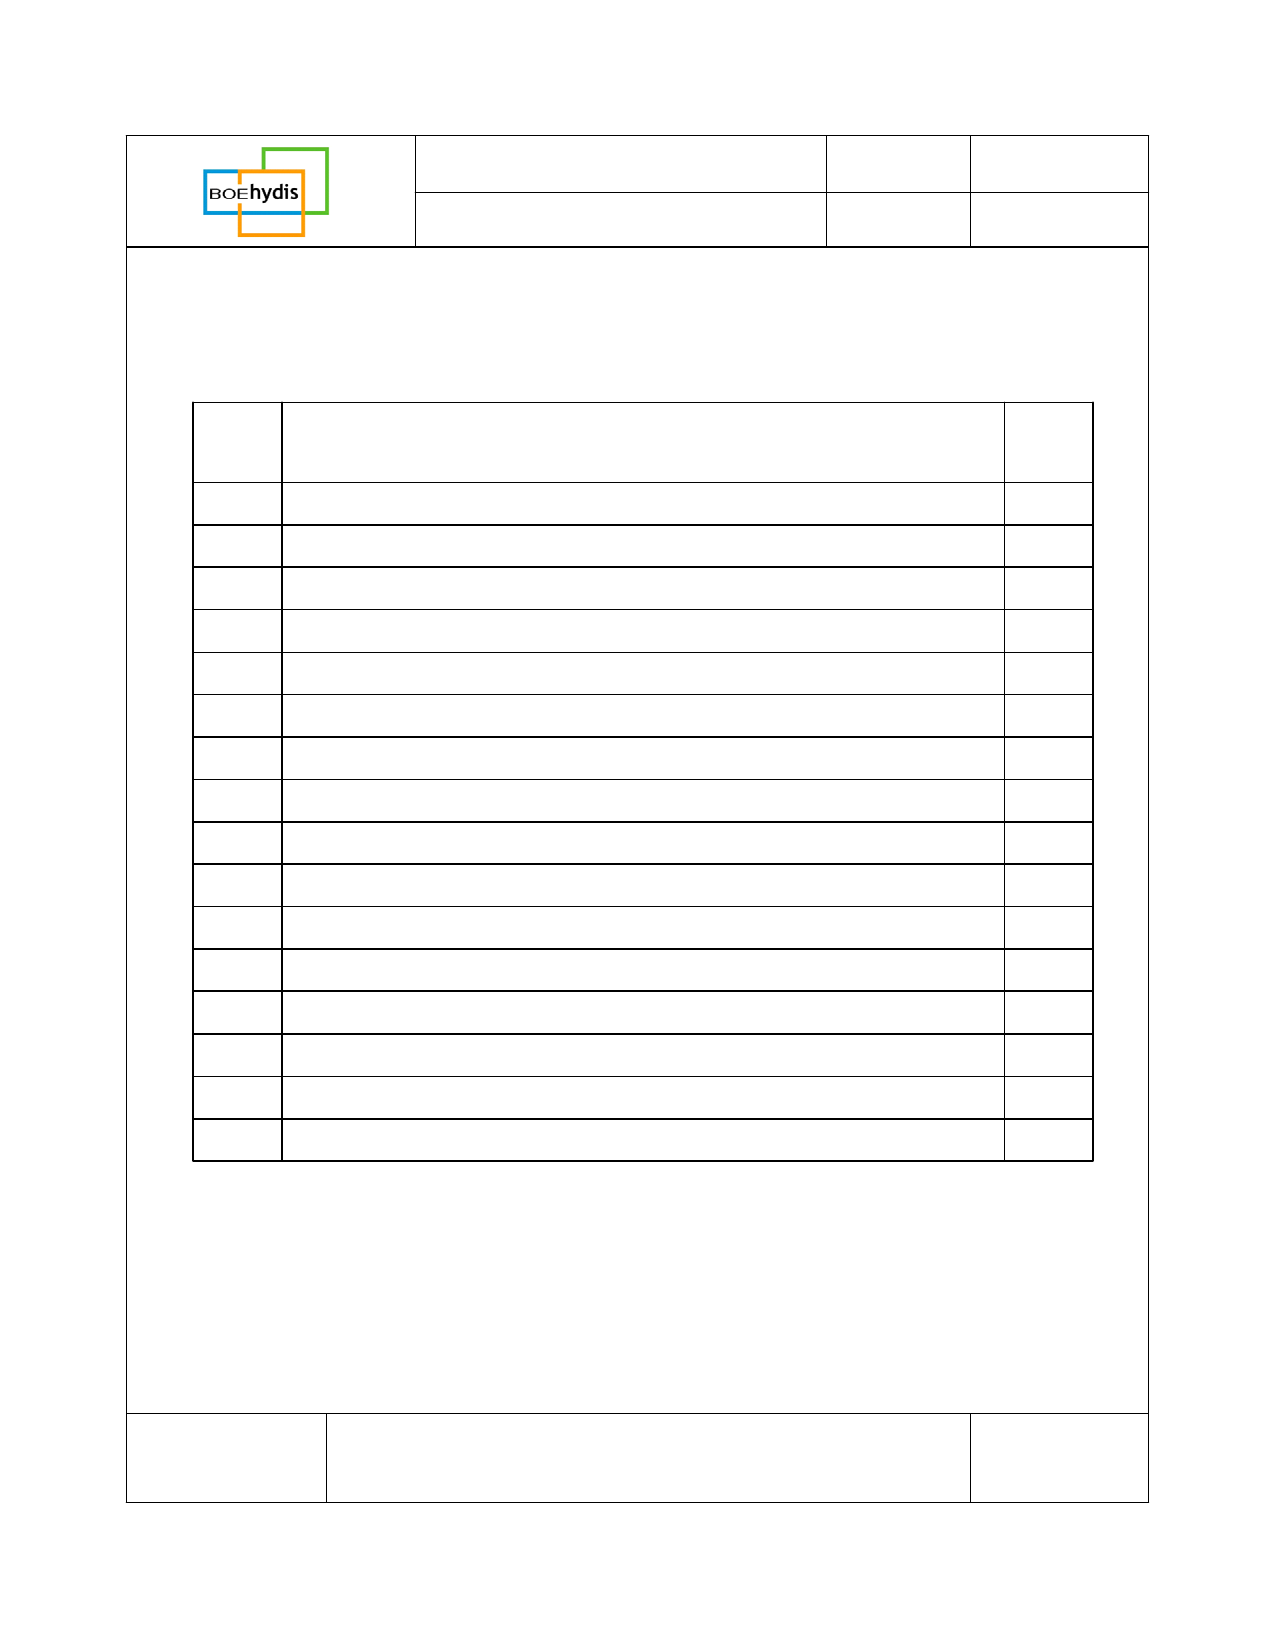 HV121WX5-113 pdf, ピン配列